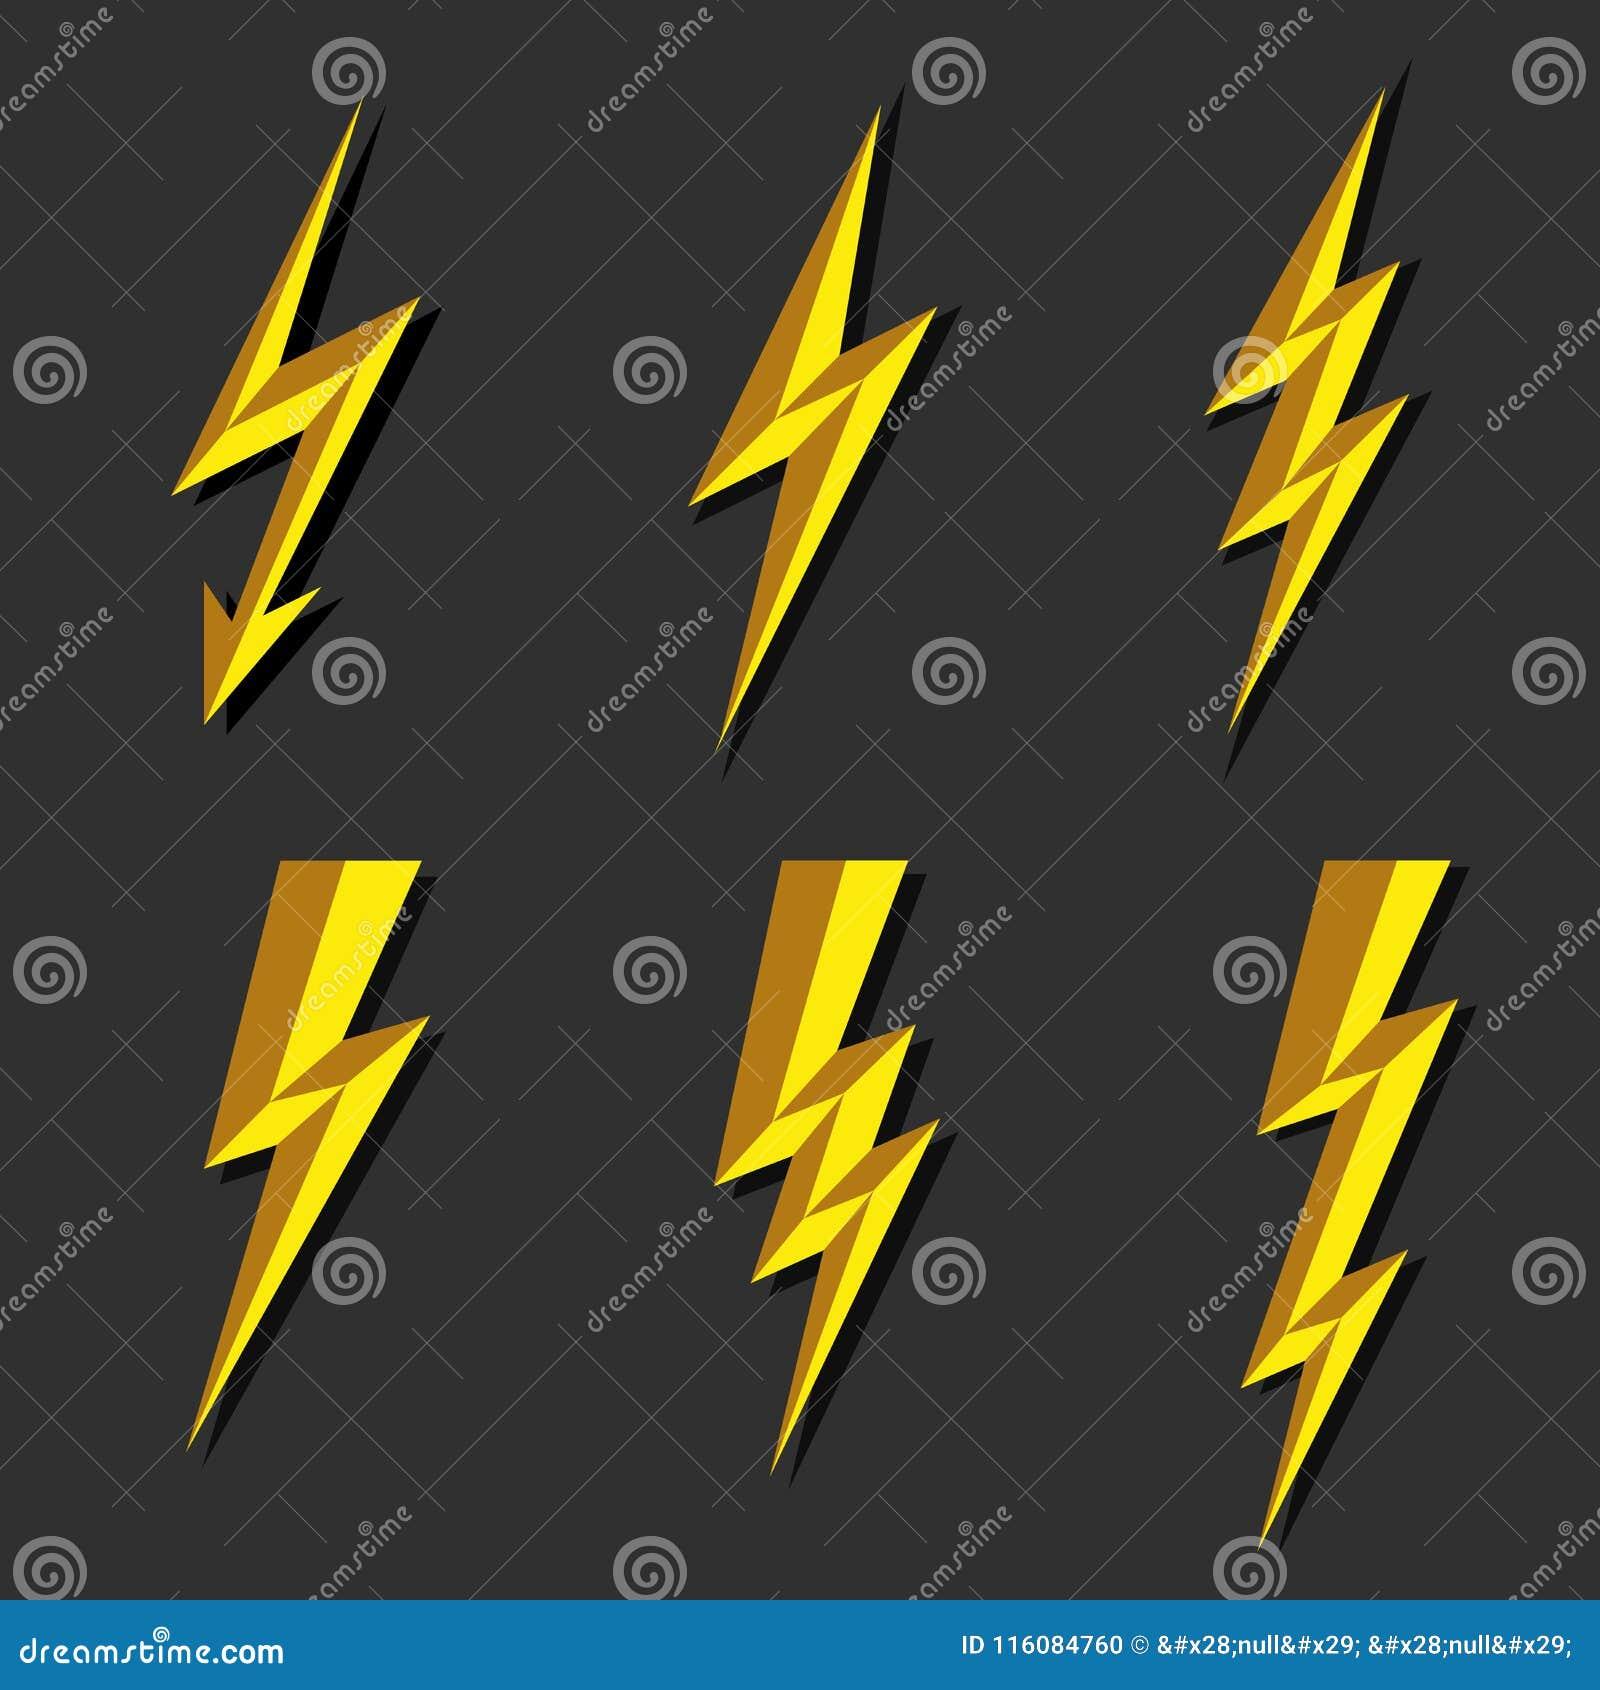 Lightning Thunderbolt Icon Vector Flash Symbol Illustration Lighting Flash Icons Set Flat Style On Dark Background Silhouette And Stock Vector Illustration Of Black Dribbling 116084760